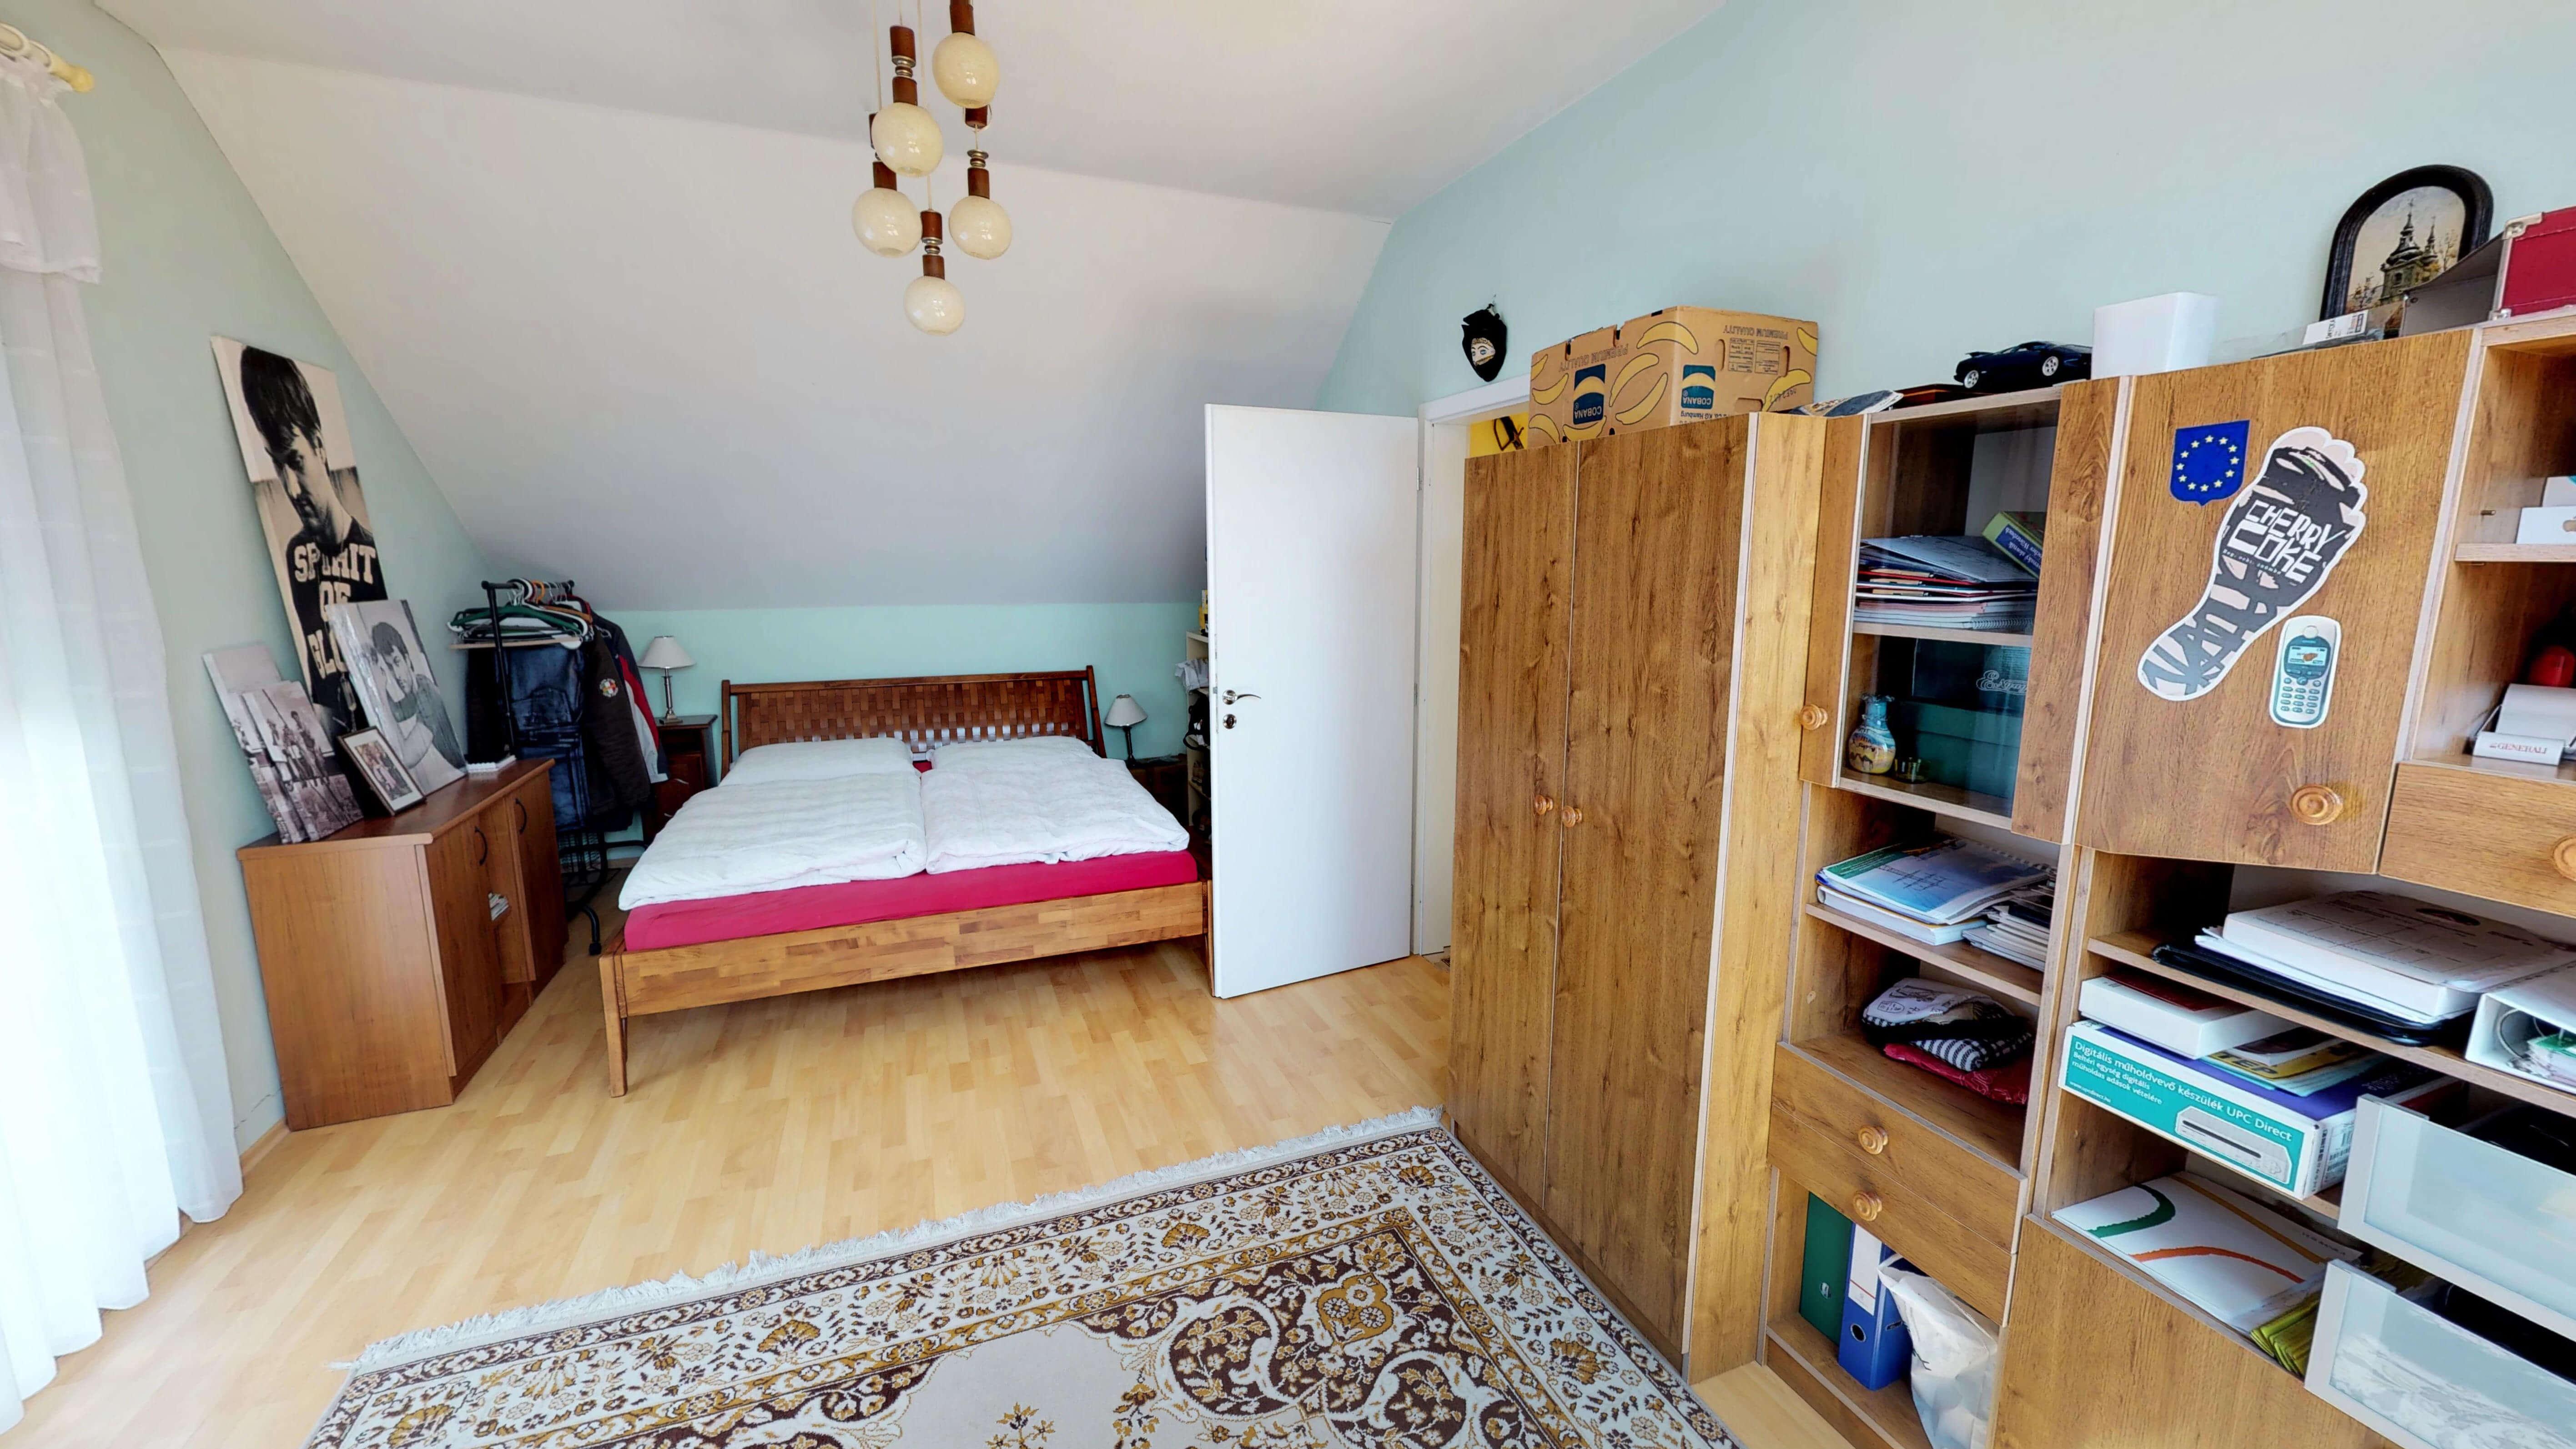 Rodinný dom na uzavretej ulici, Vojtechovce, 2 – generačný 6 izbový, úžitková 270m2, pozemok 600m2, garáž-9